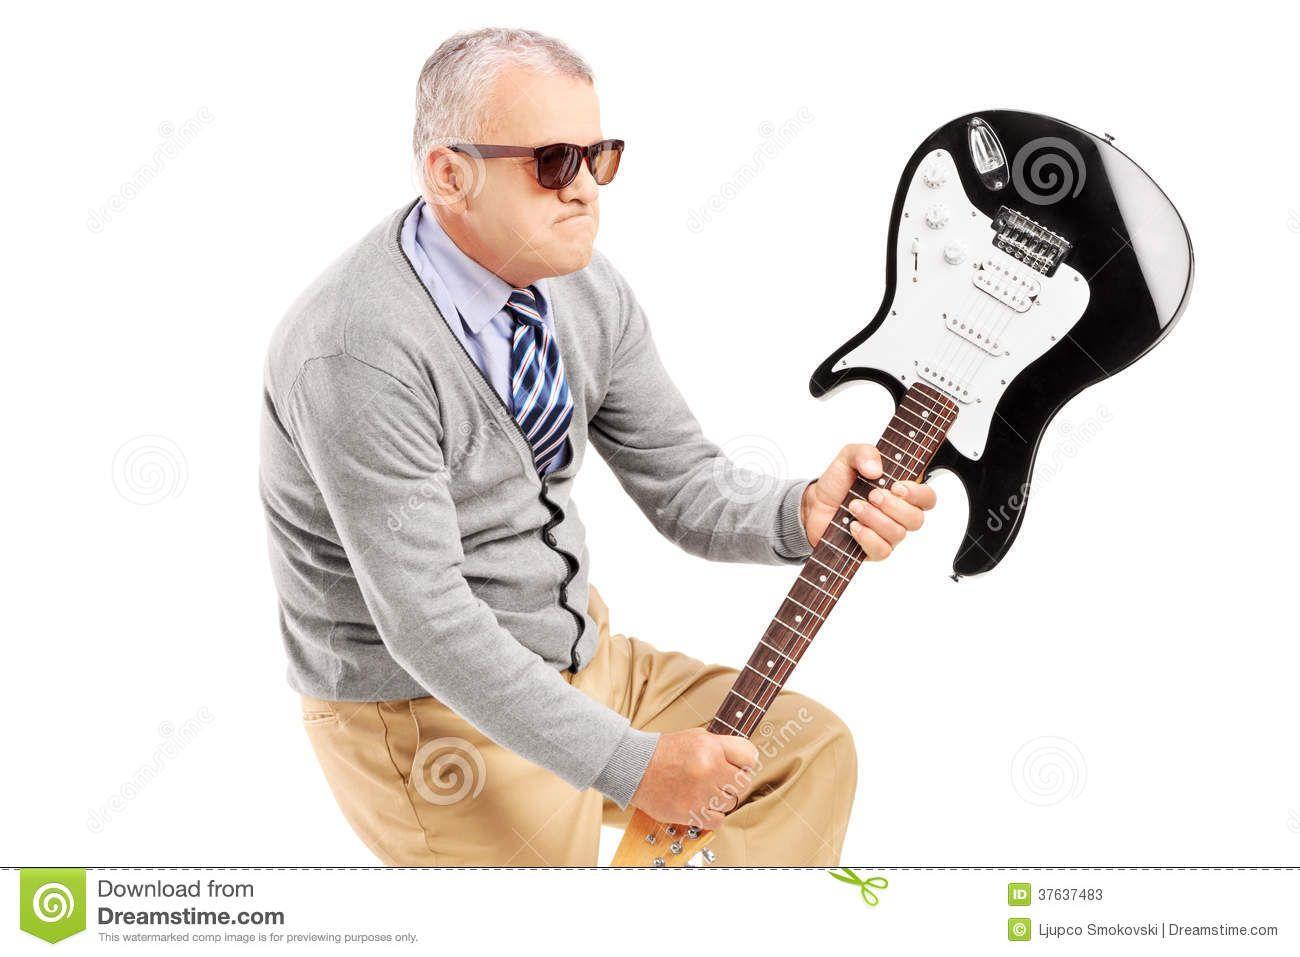 Ribbie reccomend Mature electric guitar